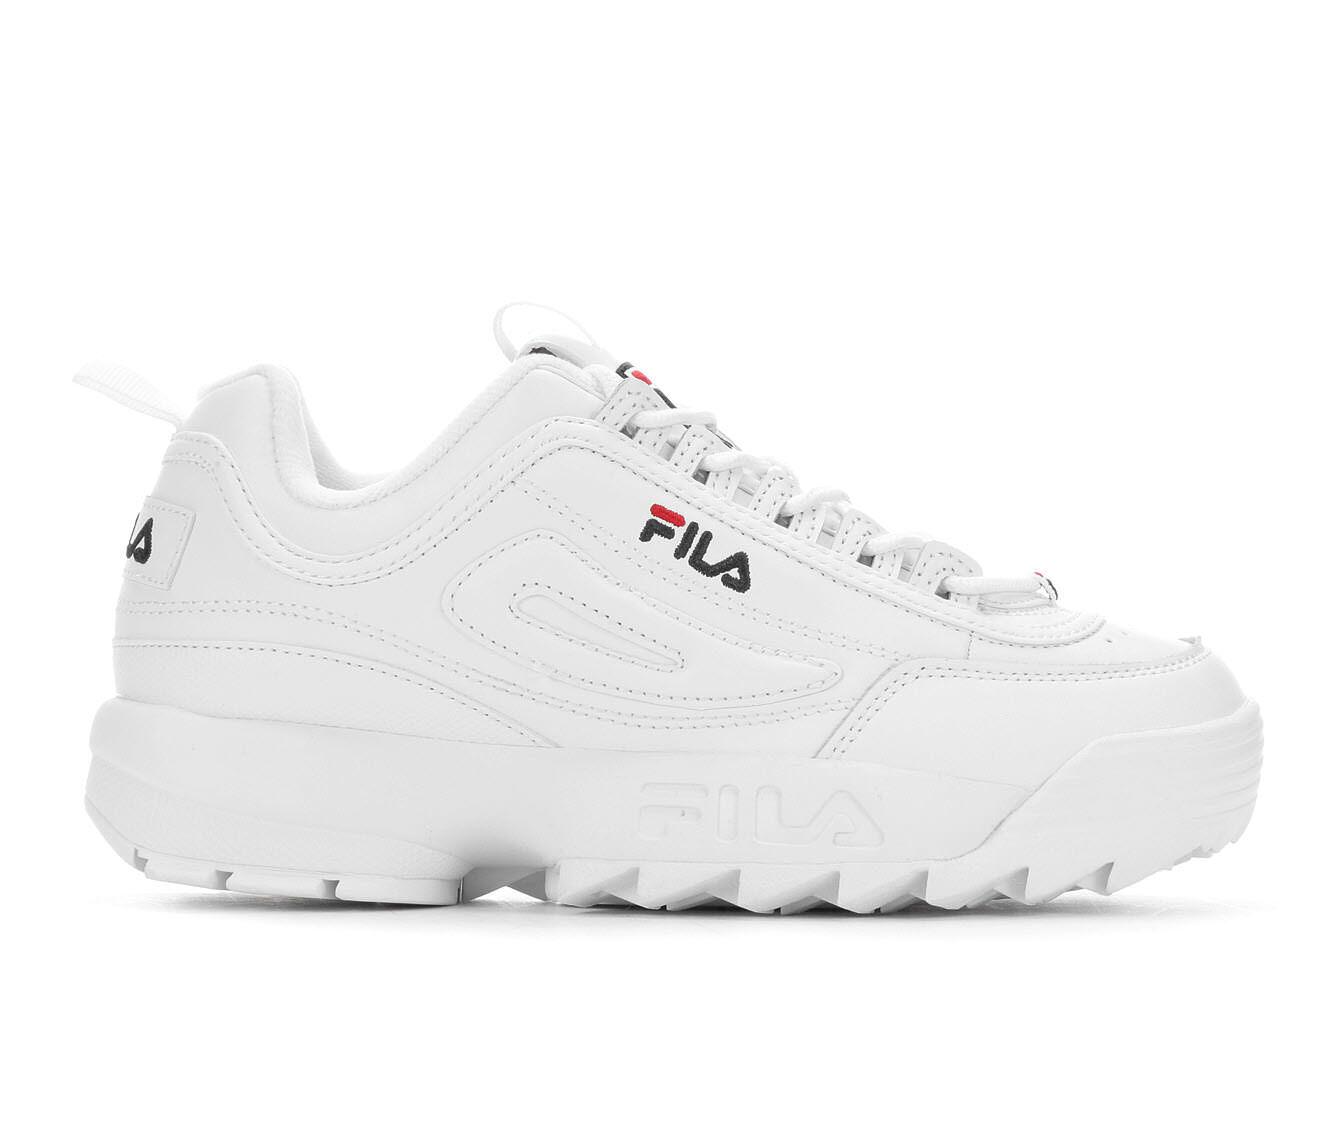 Women's Fila Disruptor II Premium Sneakers White/Navy/Red